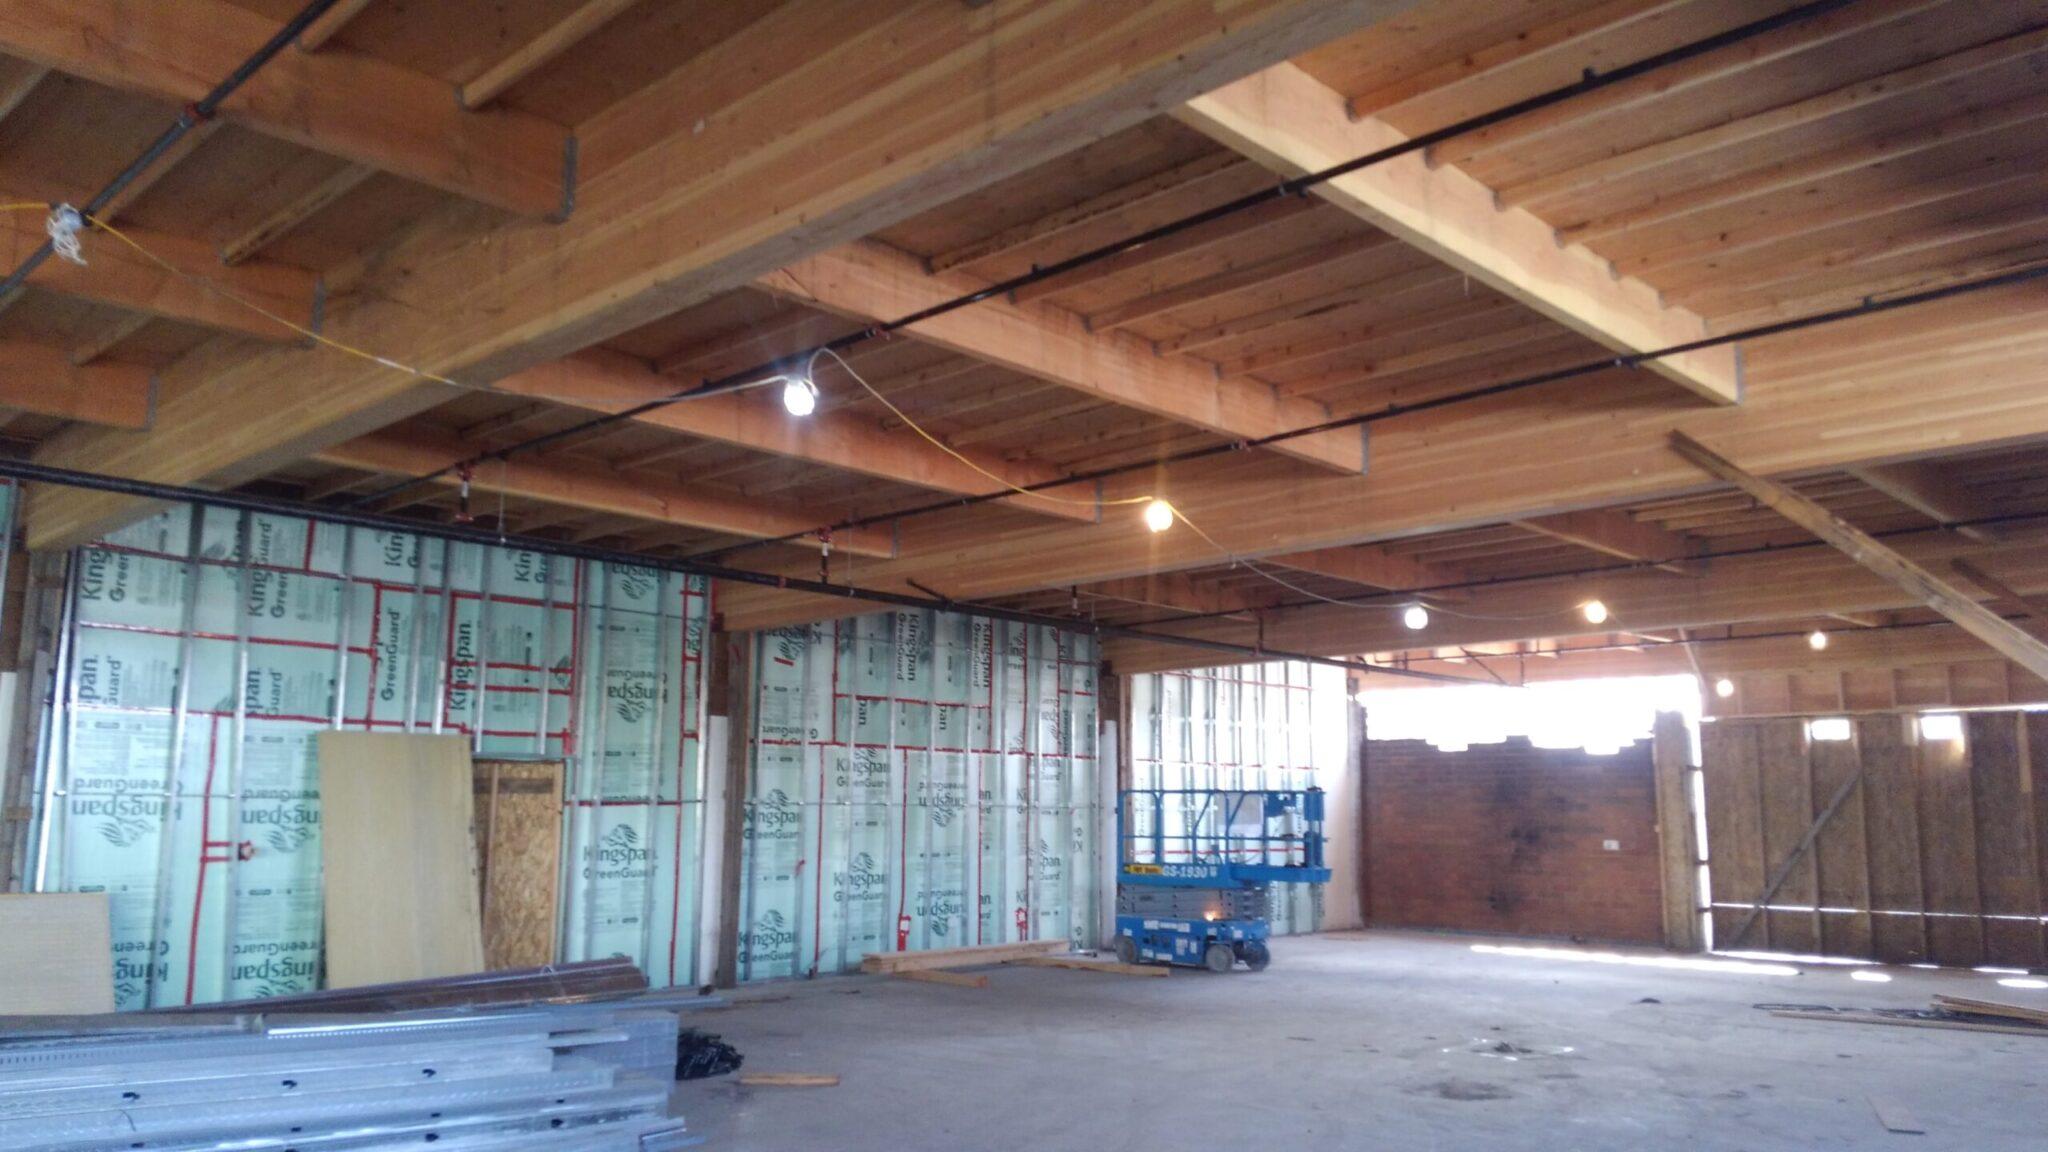 2101.4 - Interior - Valley Plaza Fire Rebuild